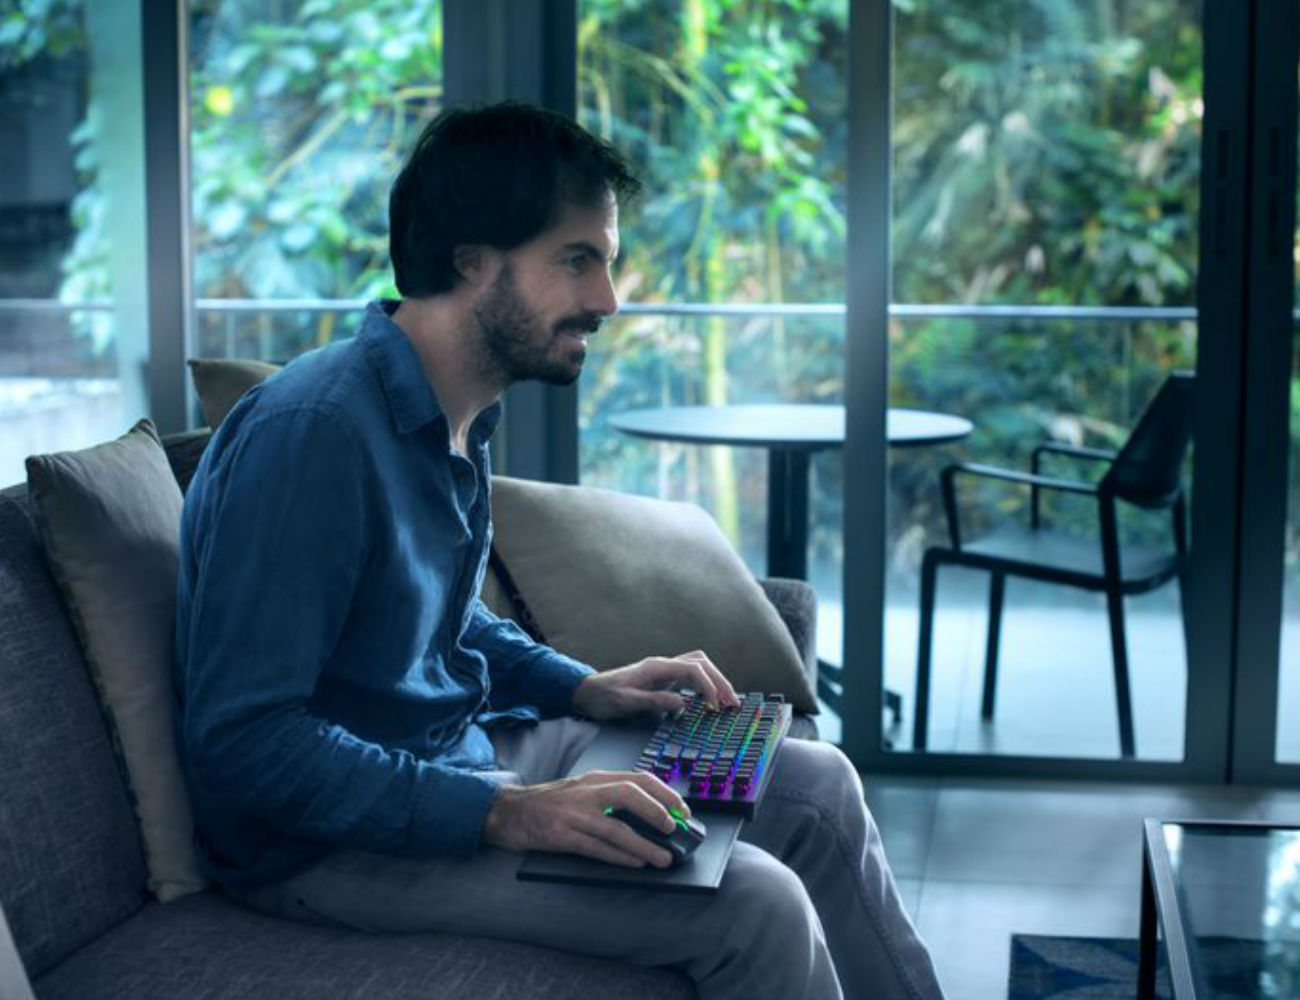 Razer Turret Xbox One Wireless Keyboard and Mouse